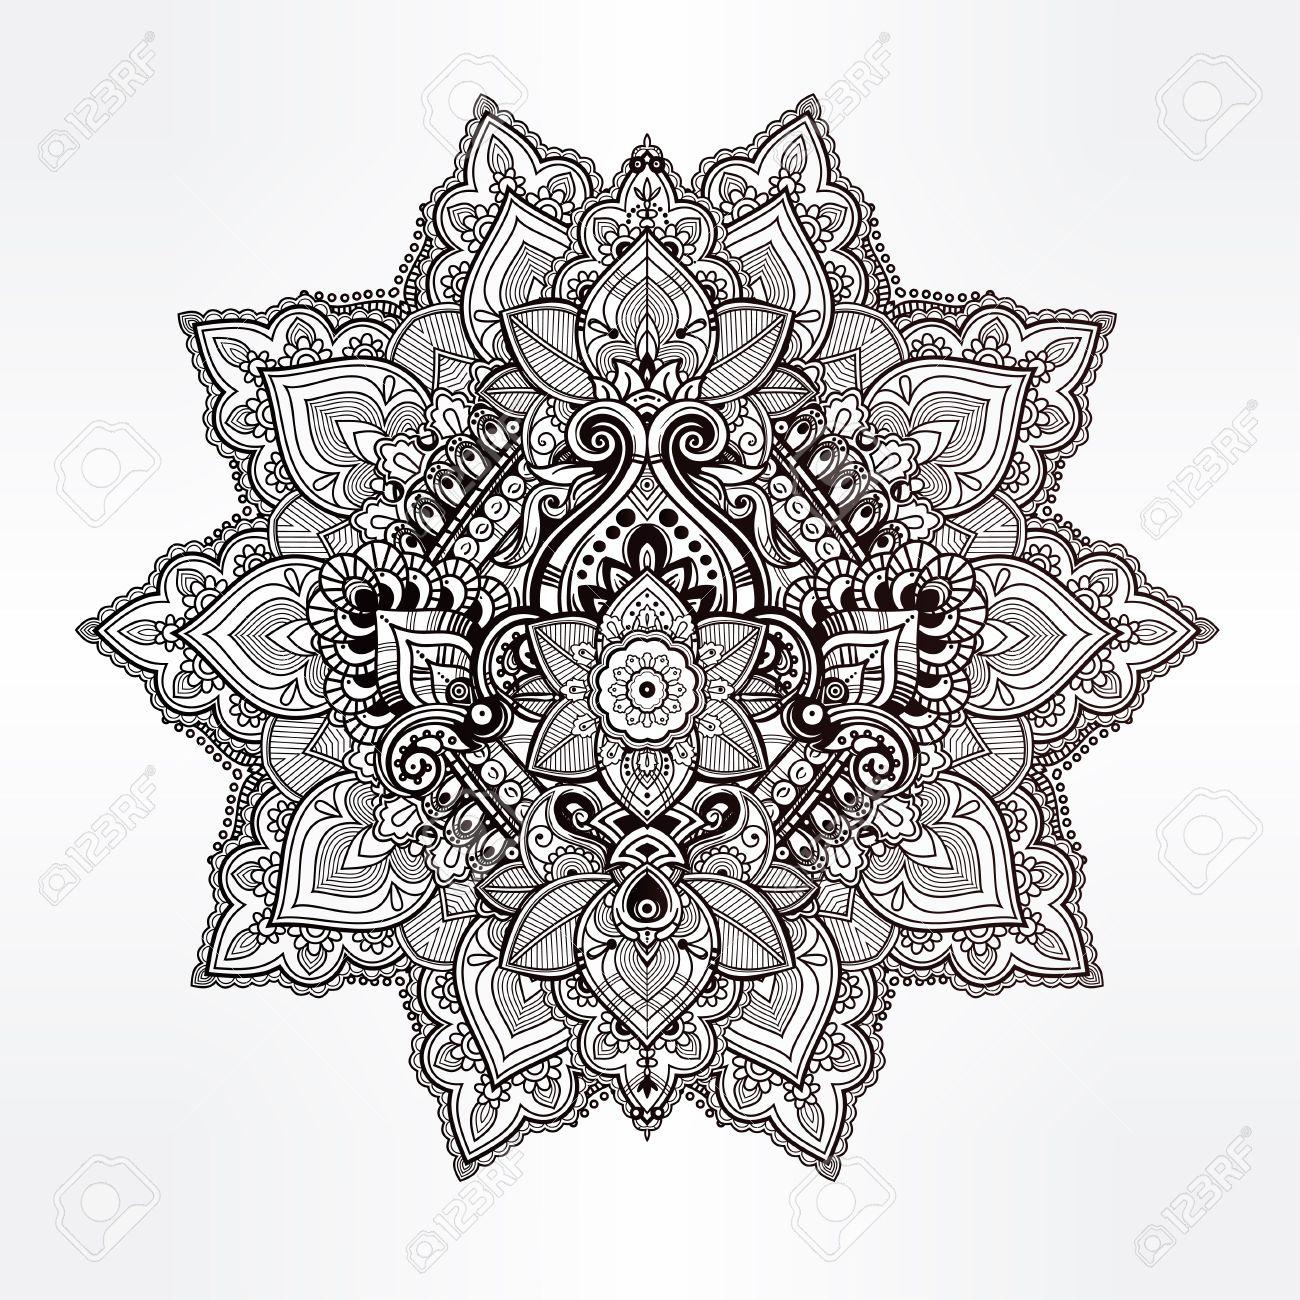 Tatouage Fleur Mandala Affordable Fleur De Lotus Tattoo Dessin